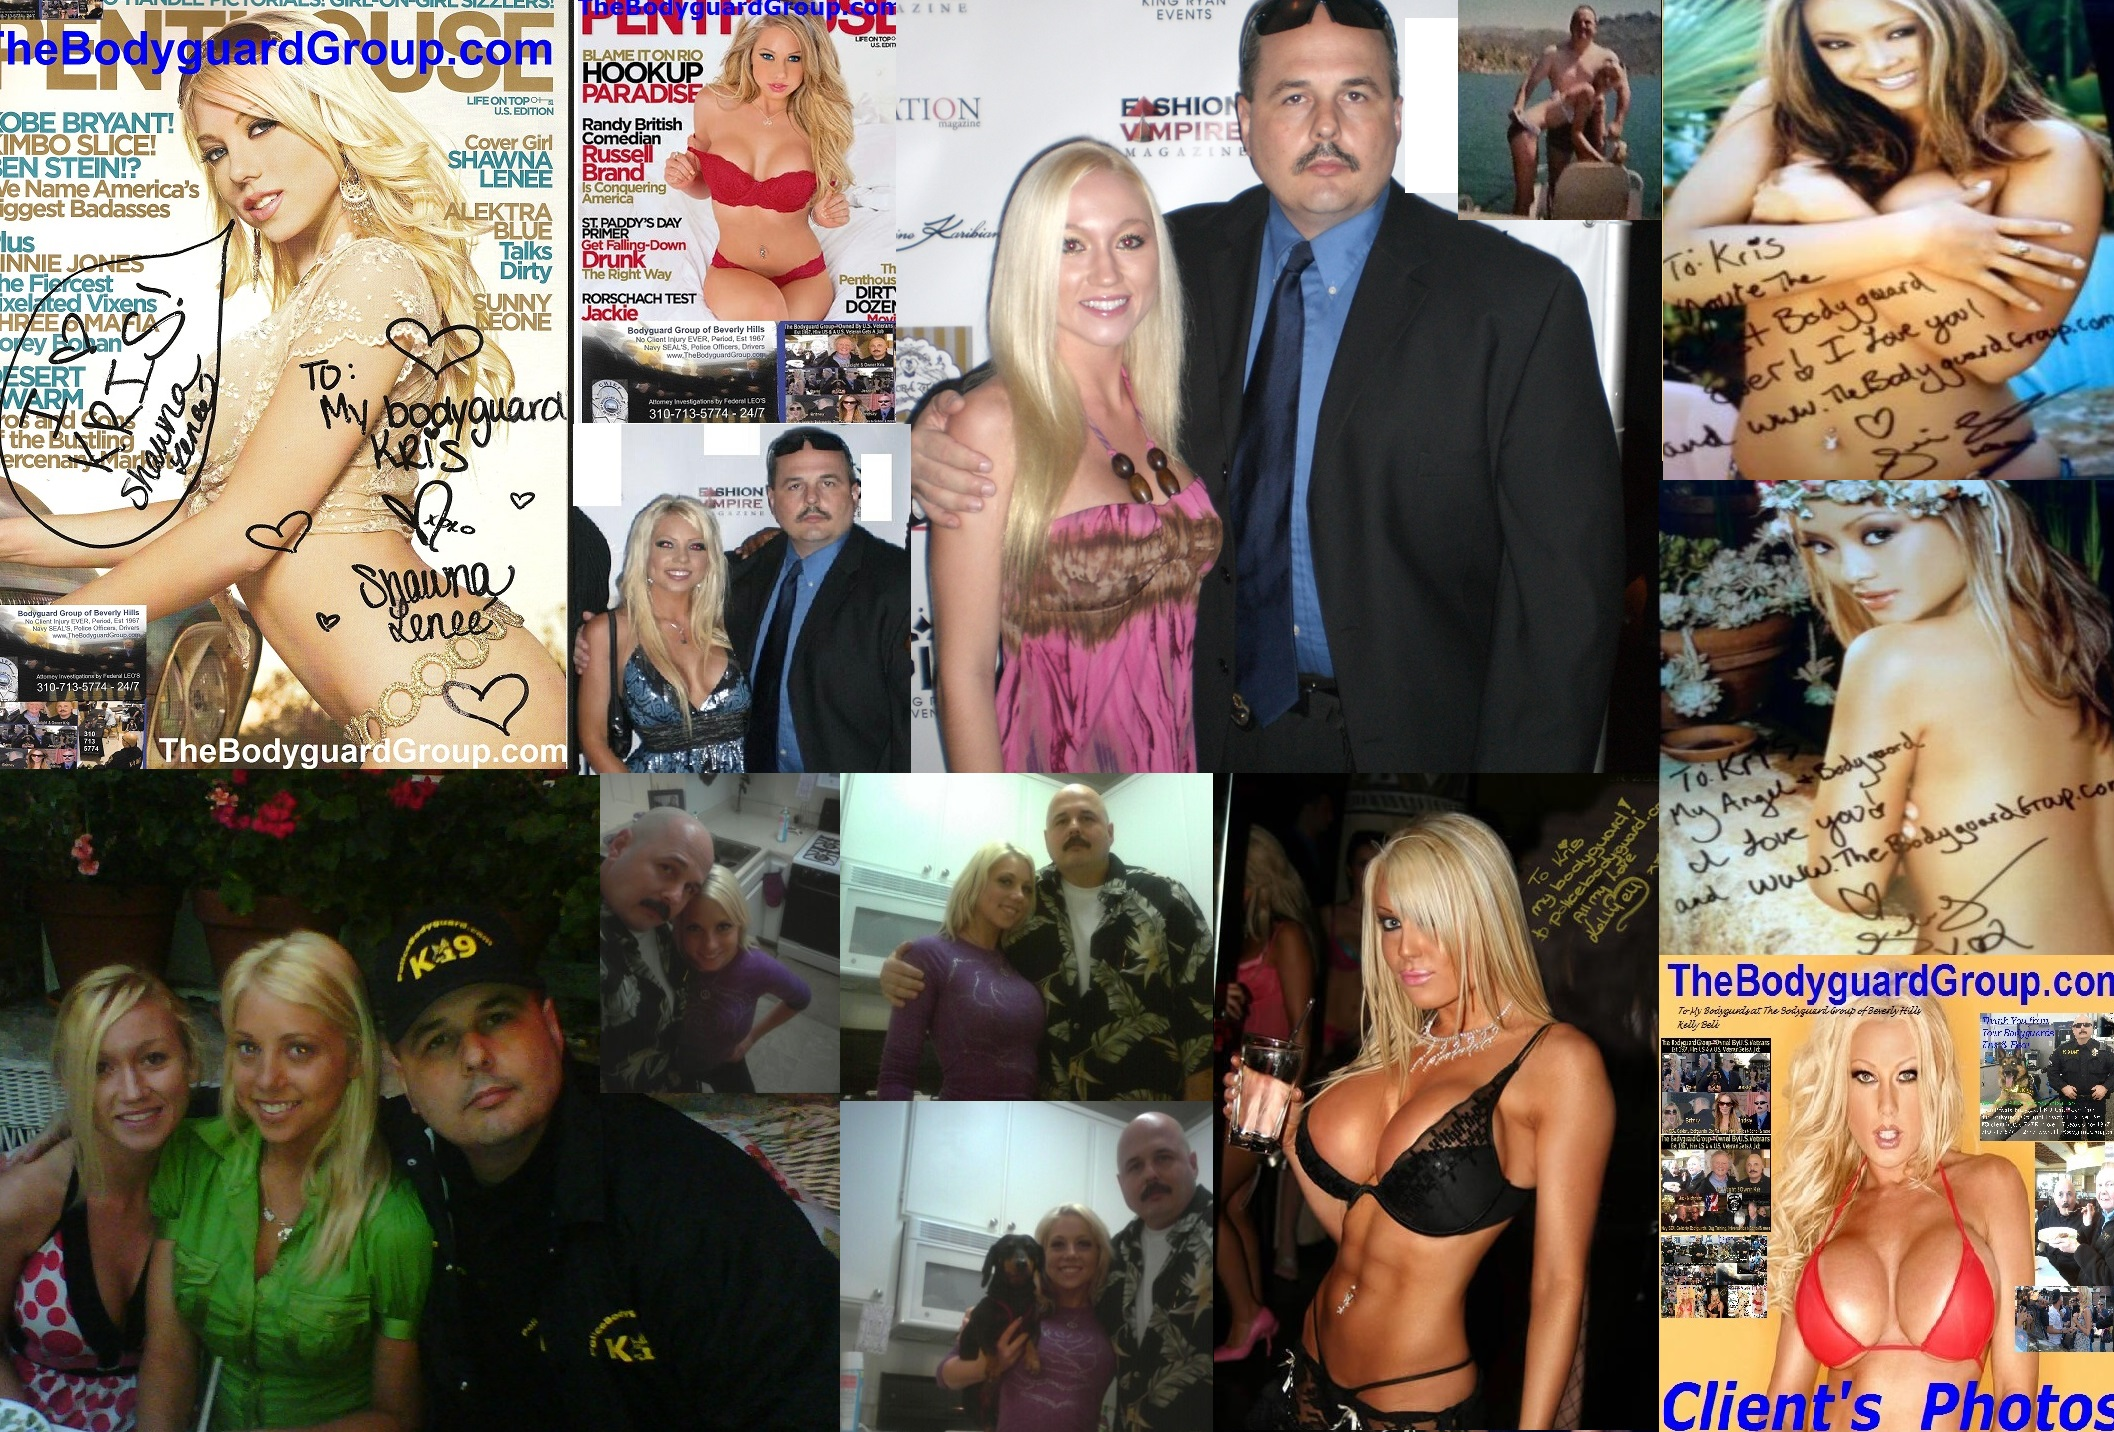 Famous celebrity bodyguard kris herzog girlfriends, The Bodyguard Group of Beverly Hills 90210, Los Angeles, Celebrity Bodyguards for hire for hire